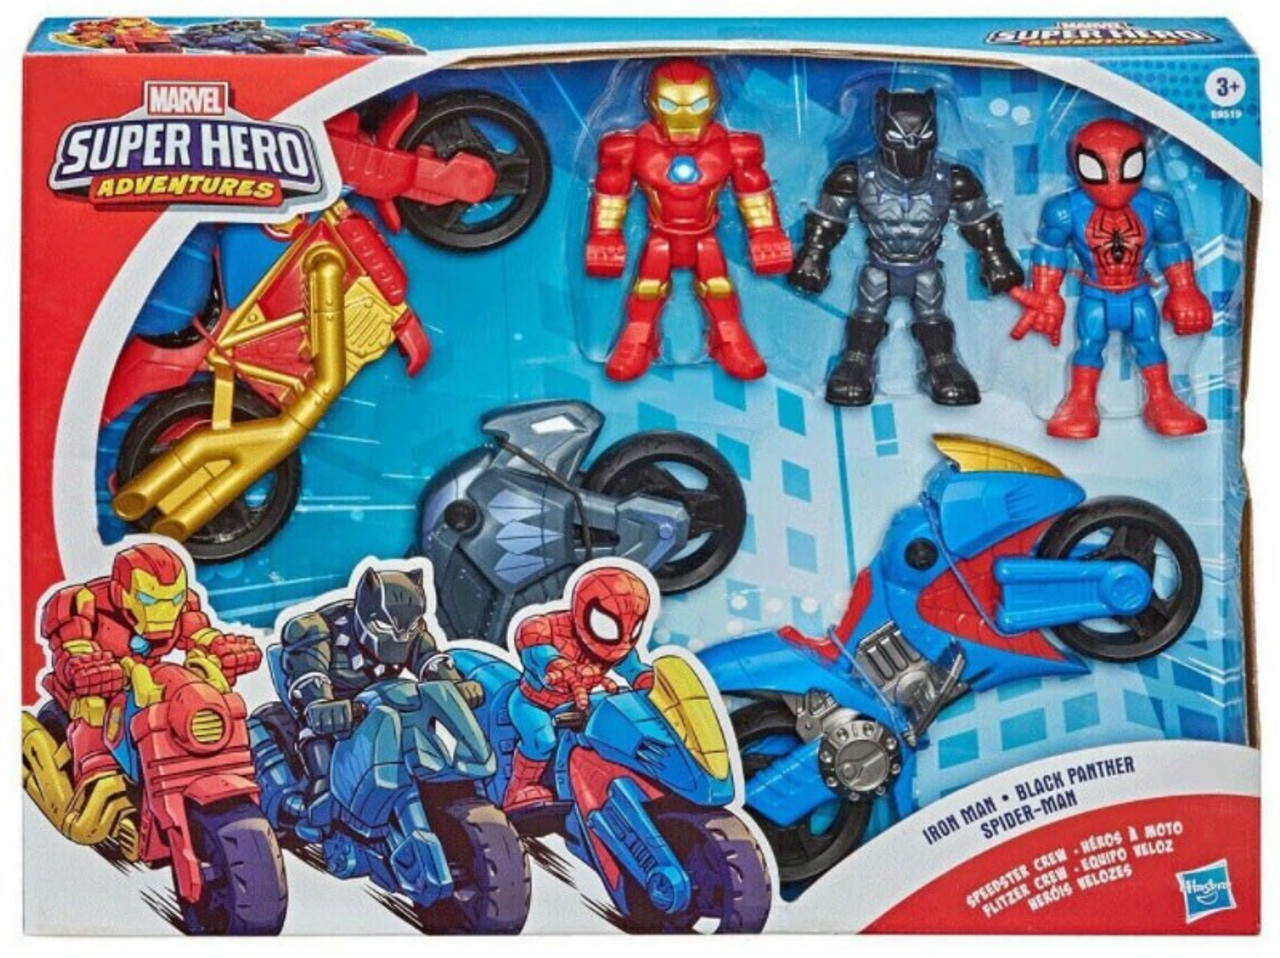 Playskool Eroi Marvel Super Eroe AVVENTURE 5-inch Spider-Man Action Figure